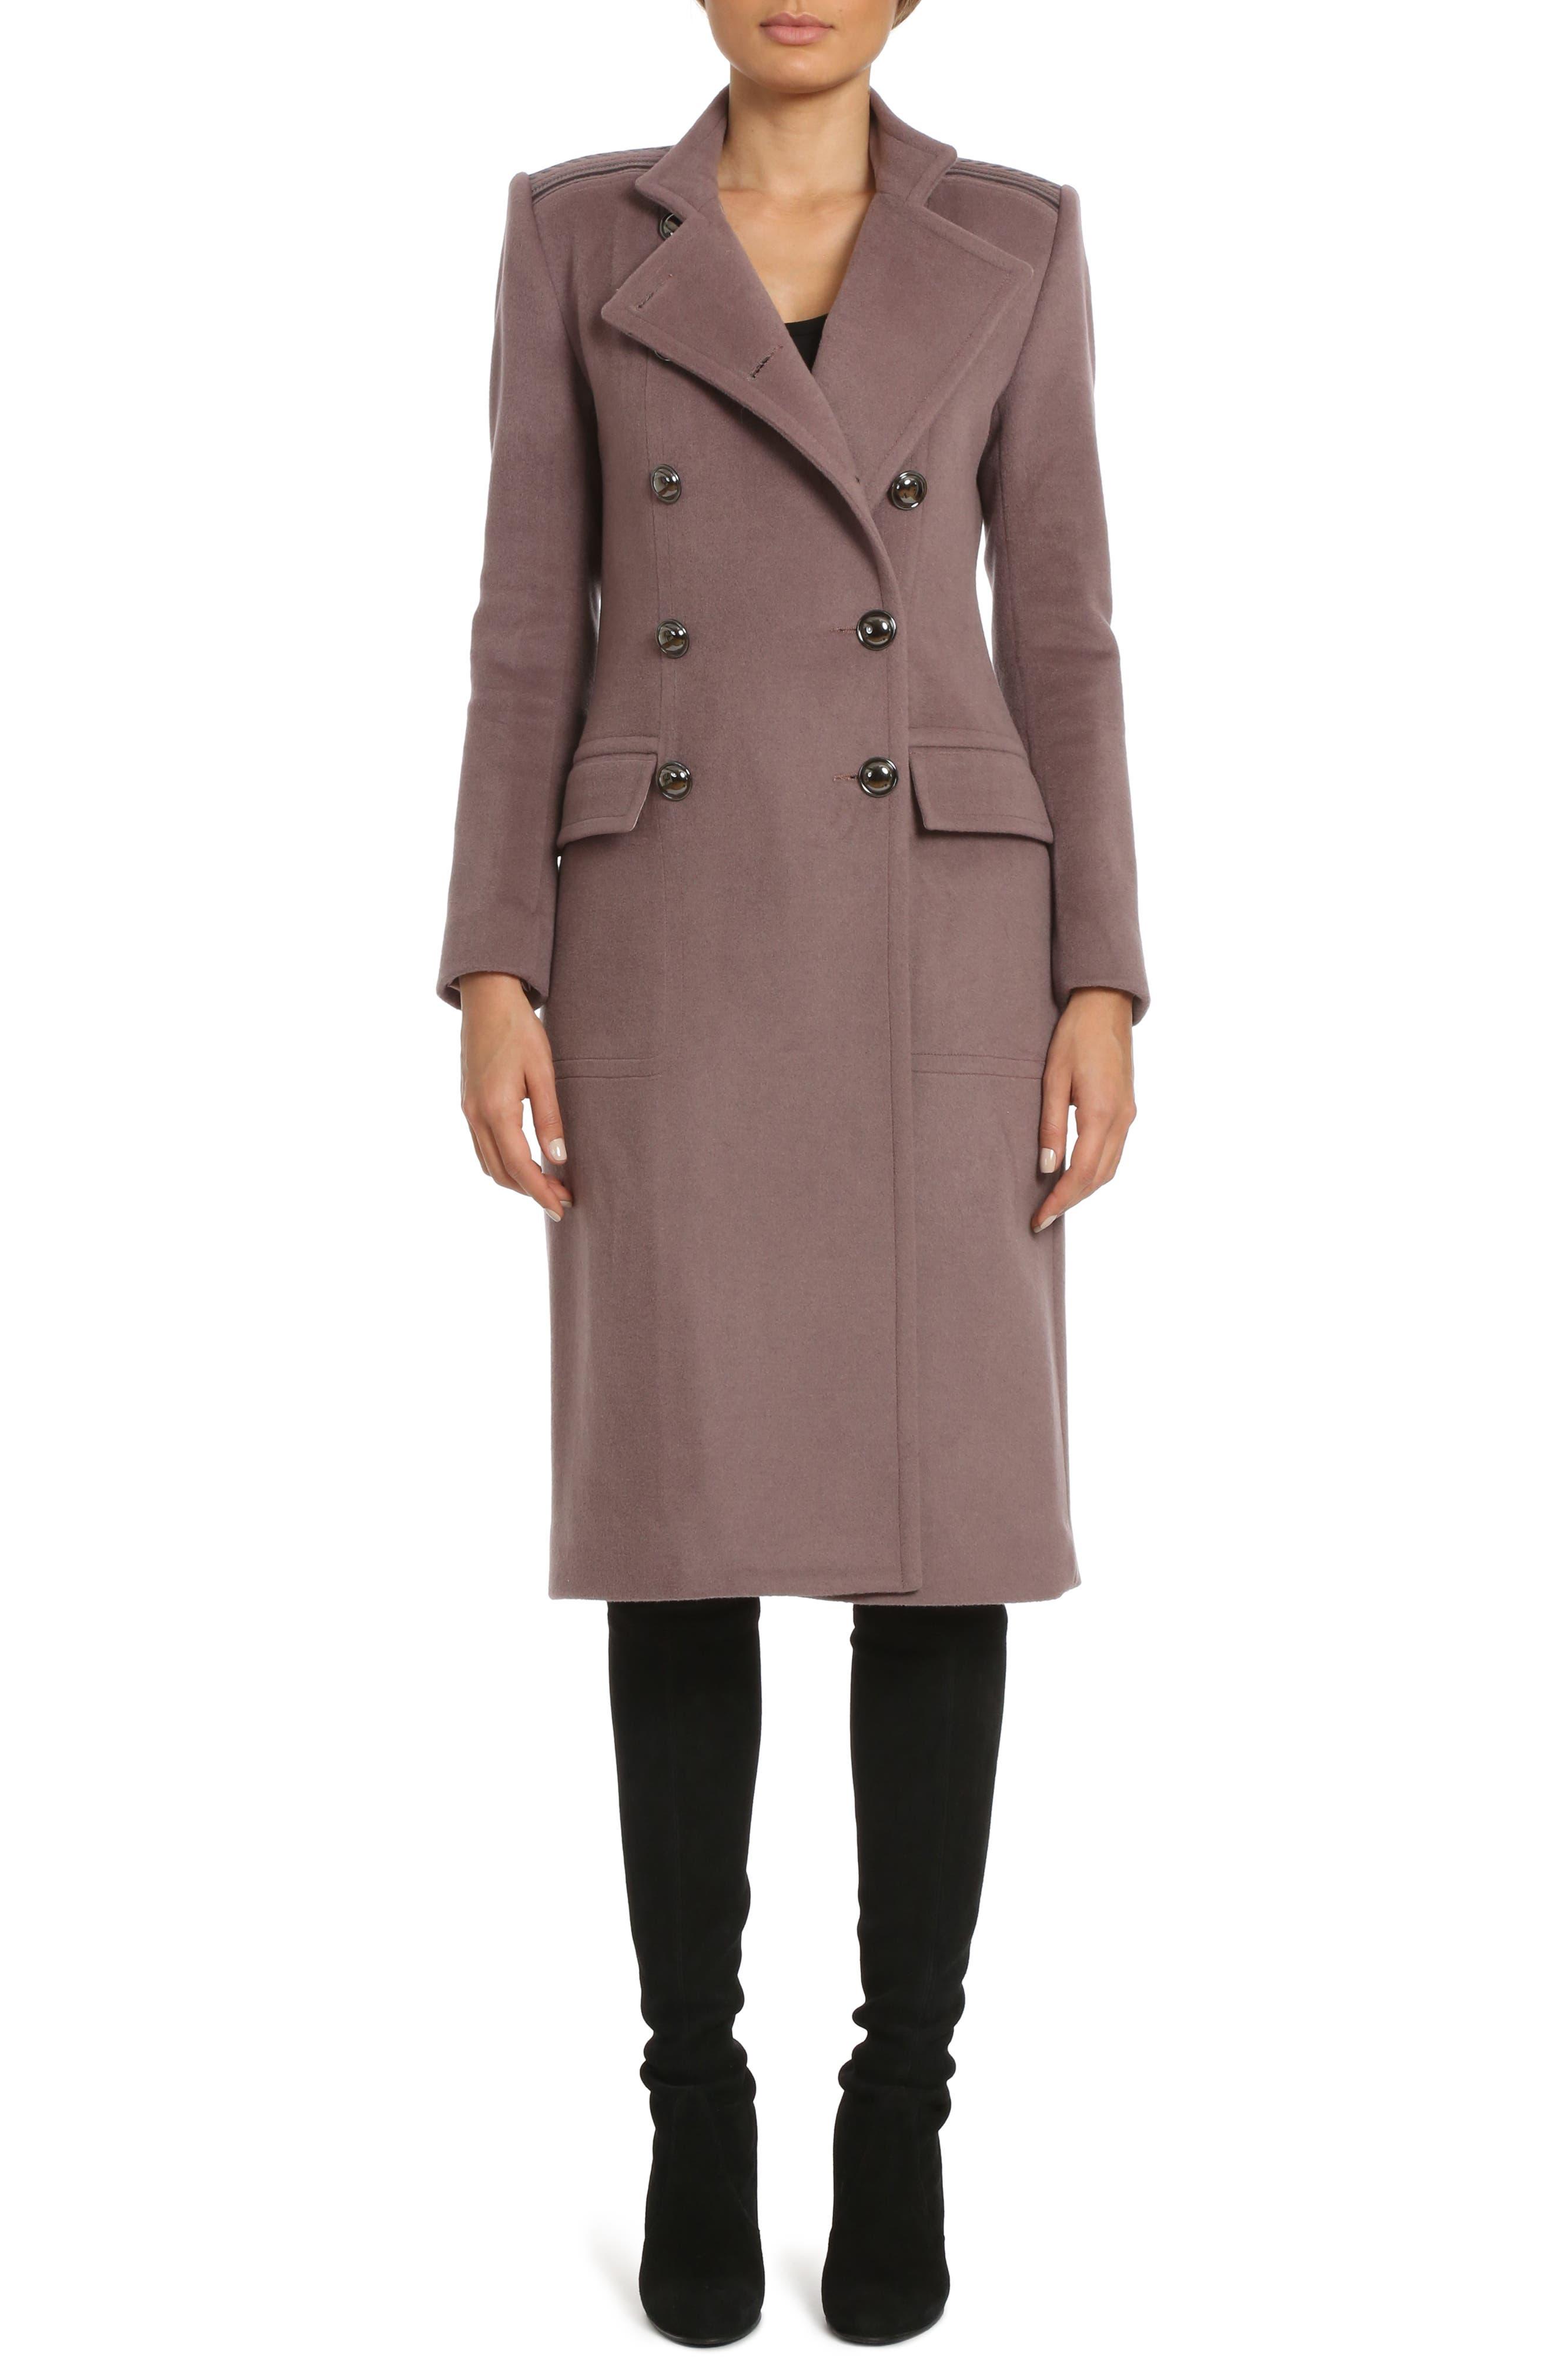 Badgley Mischka Trinity Embroidered Long Wool Blend Coat